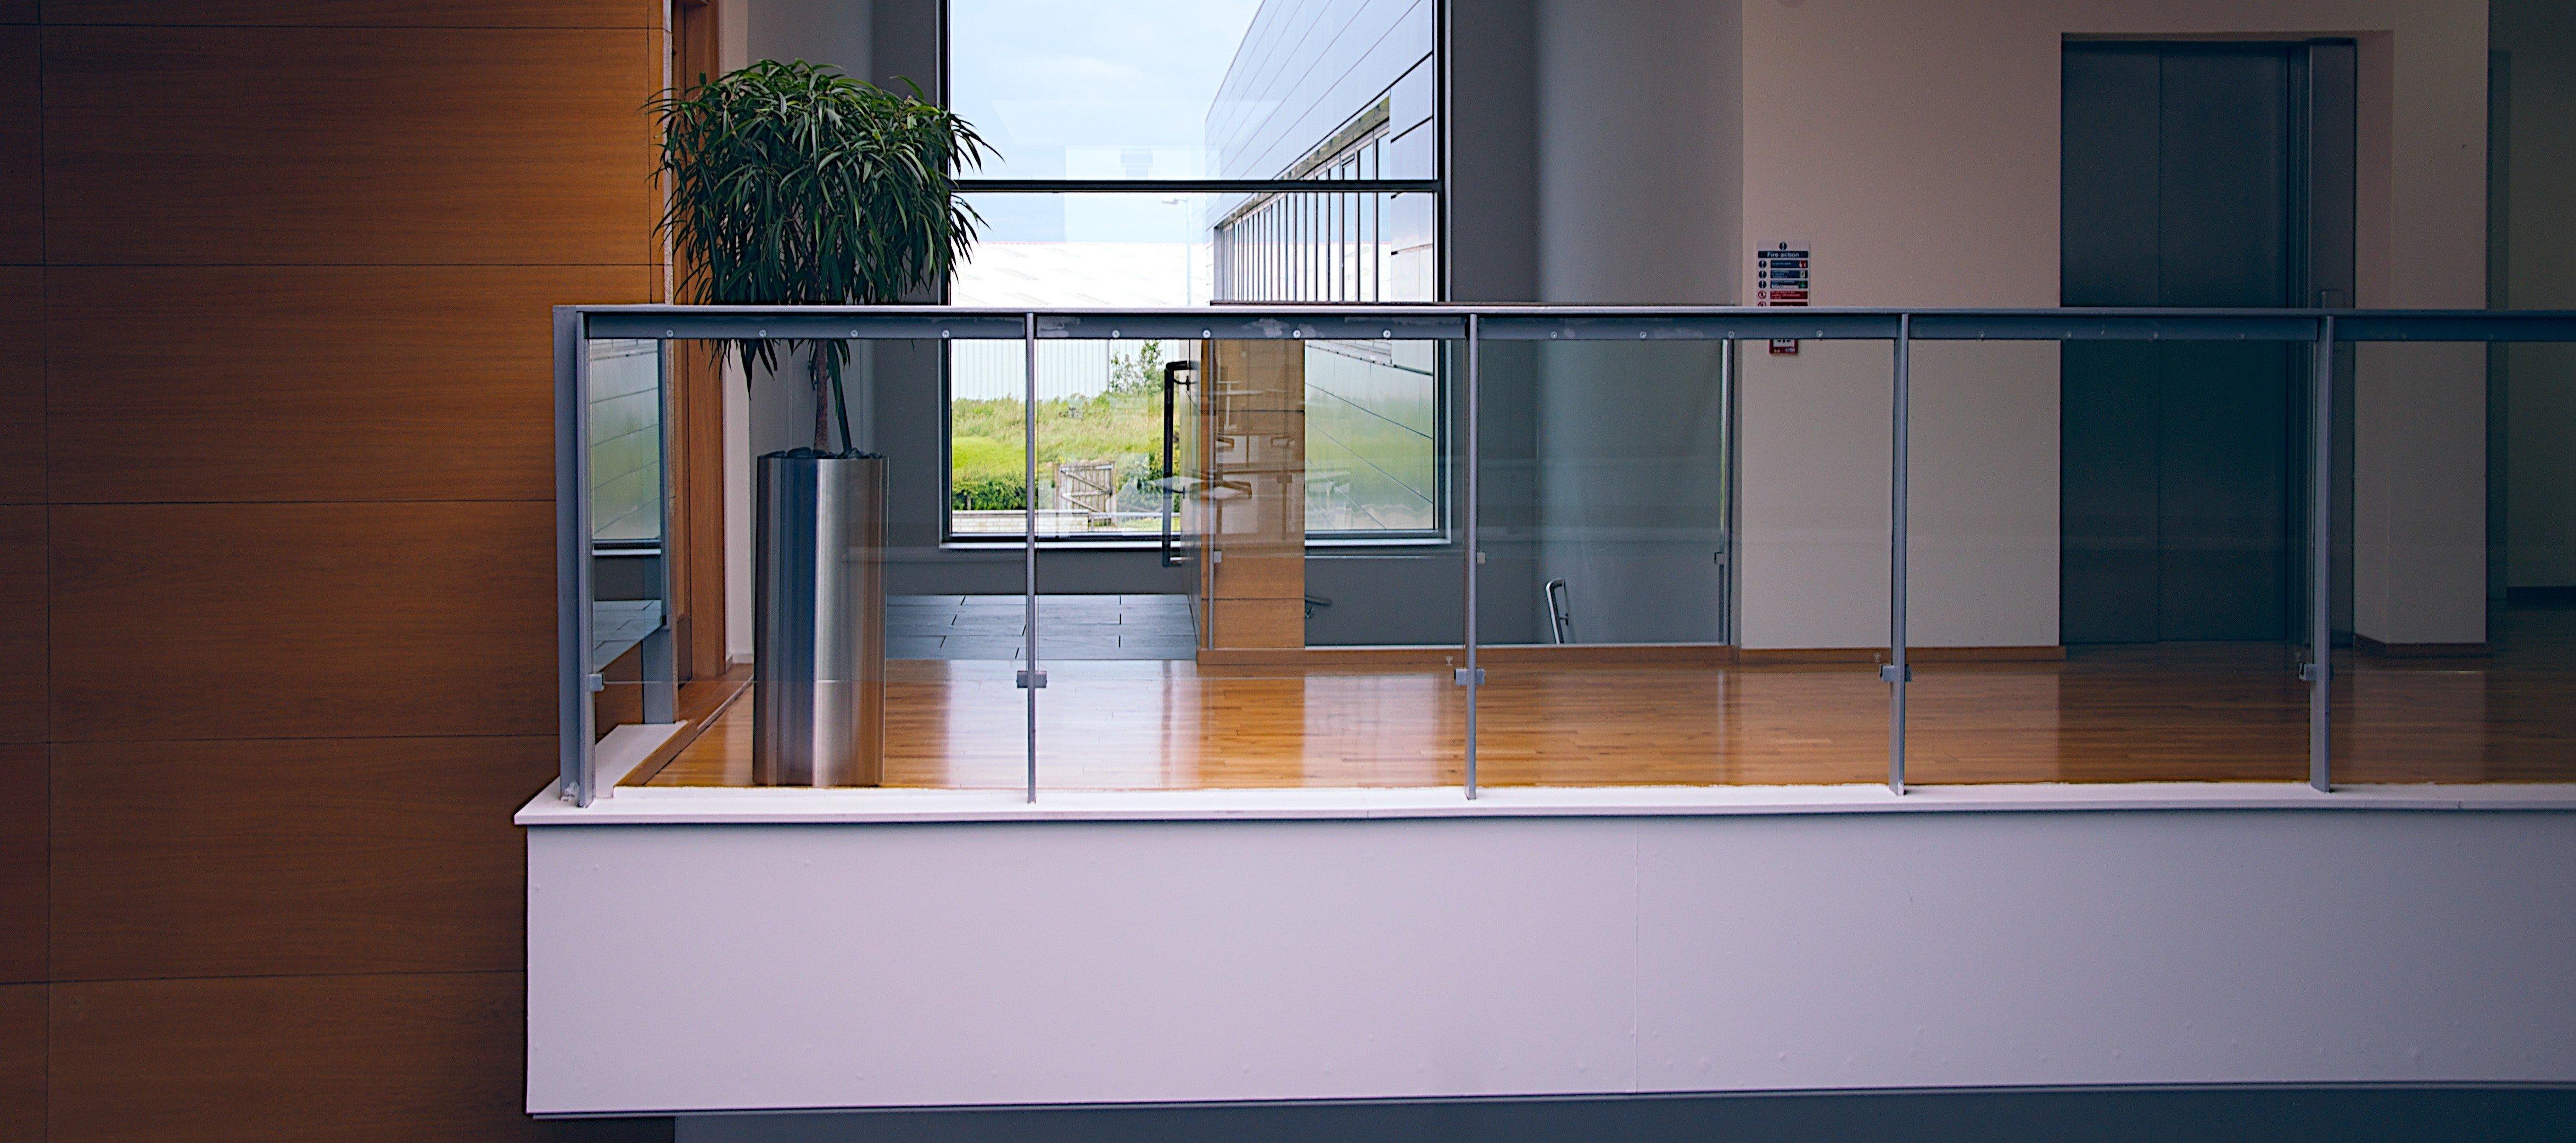 apartment-architectural-architecture-273669